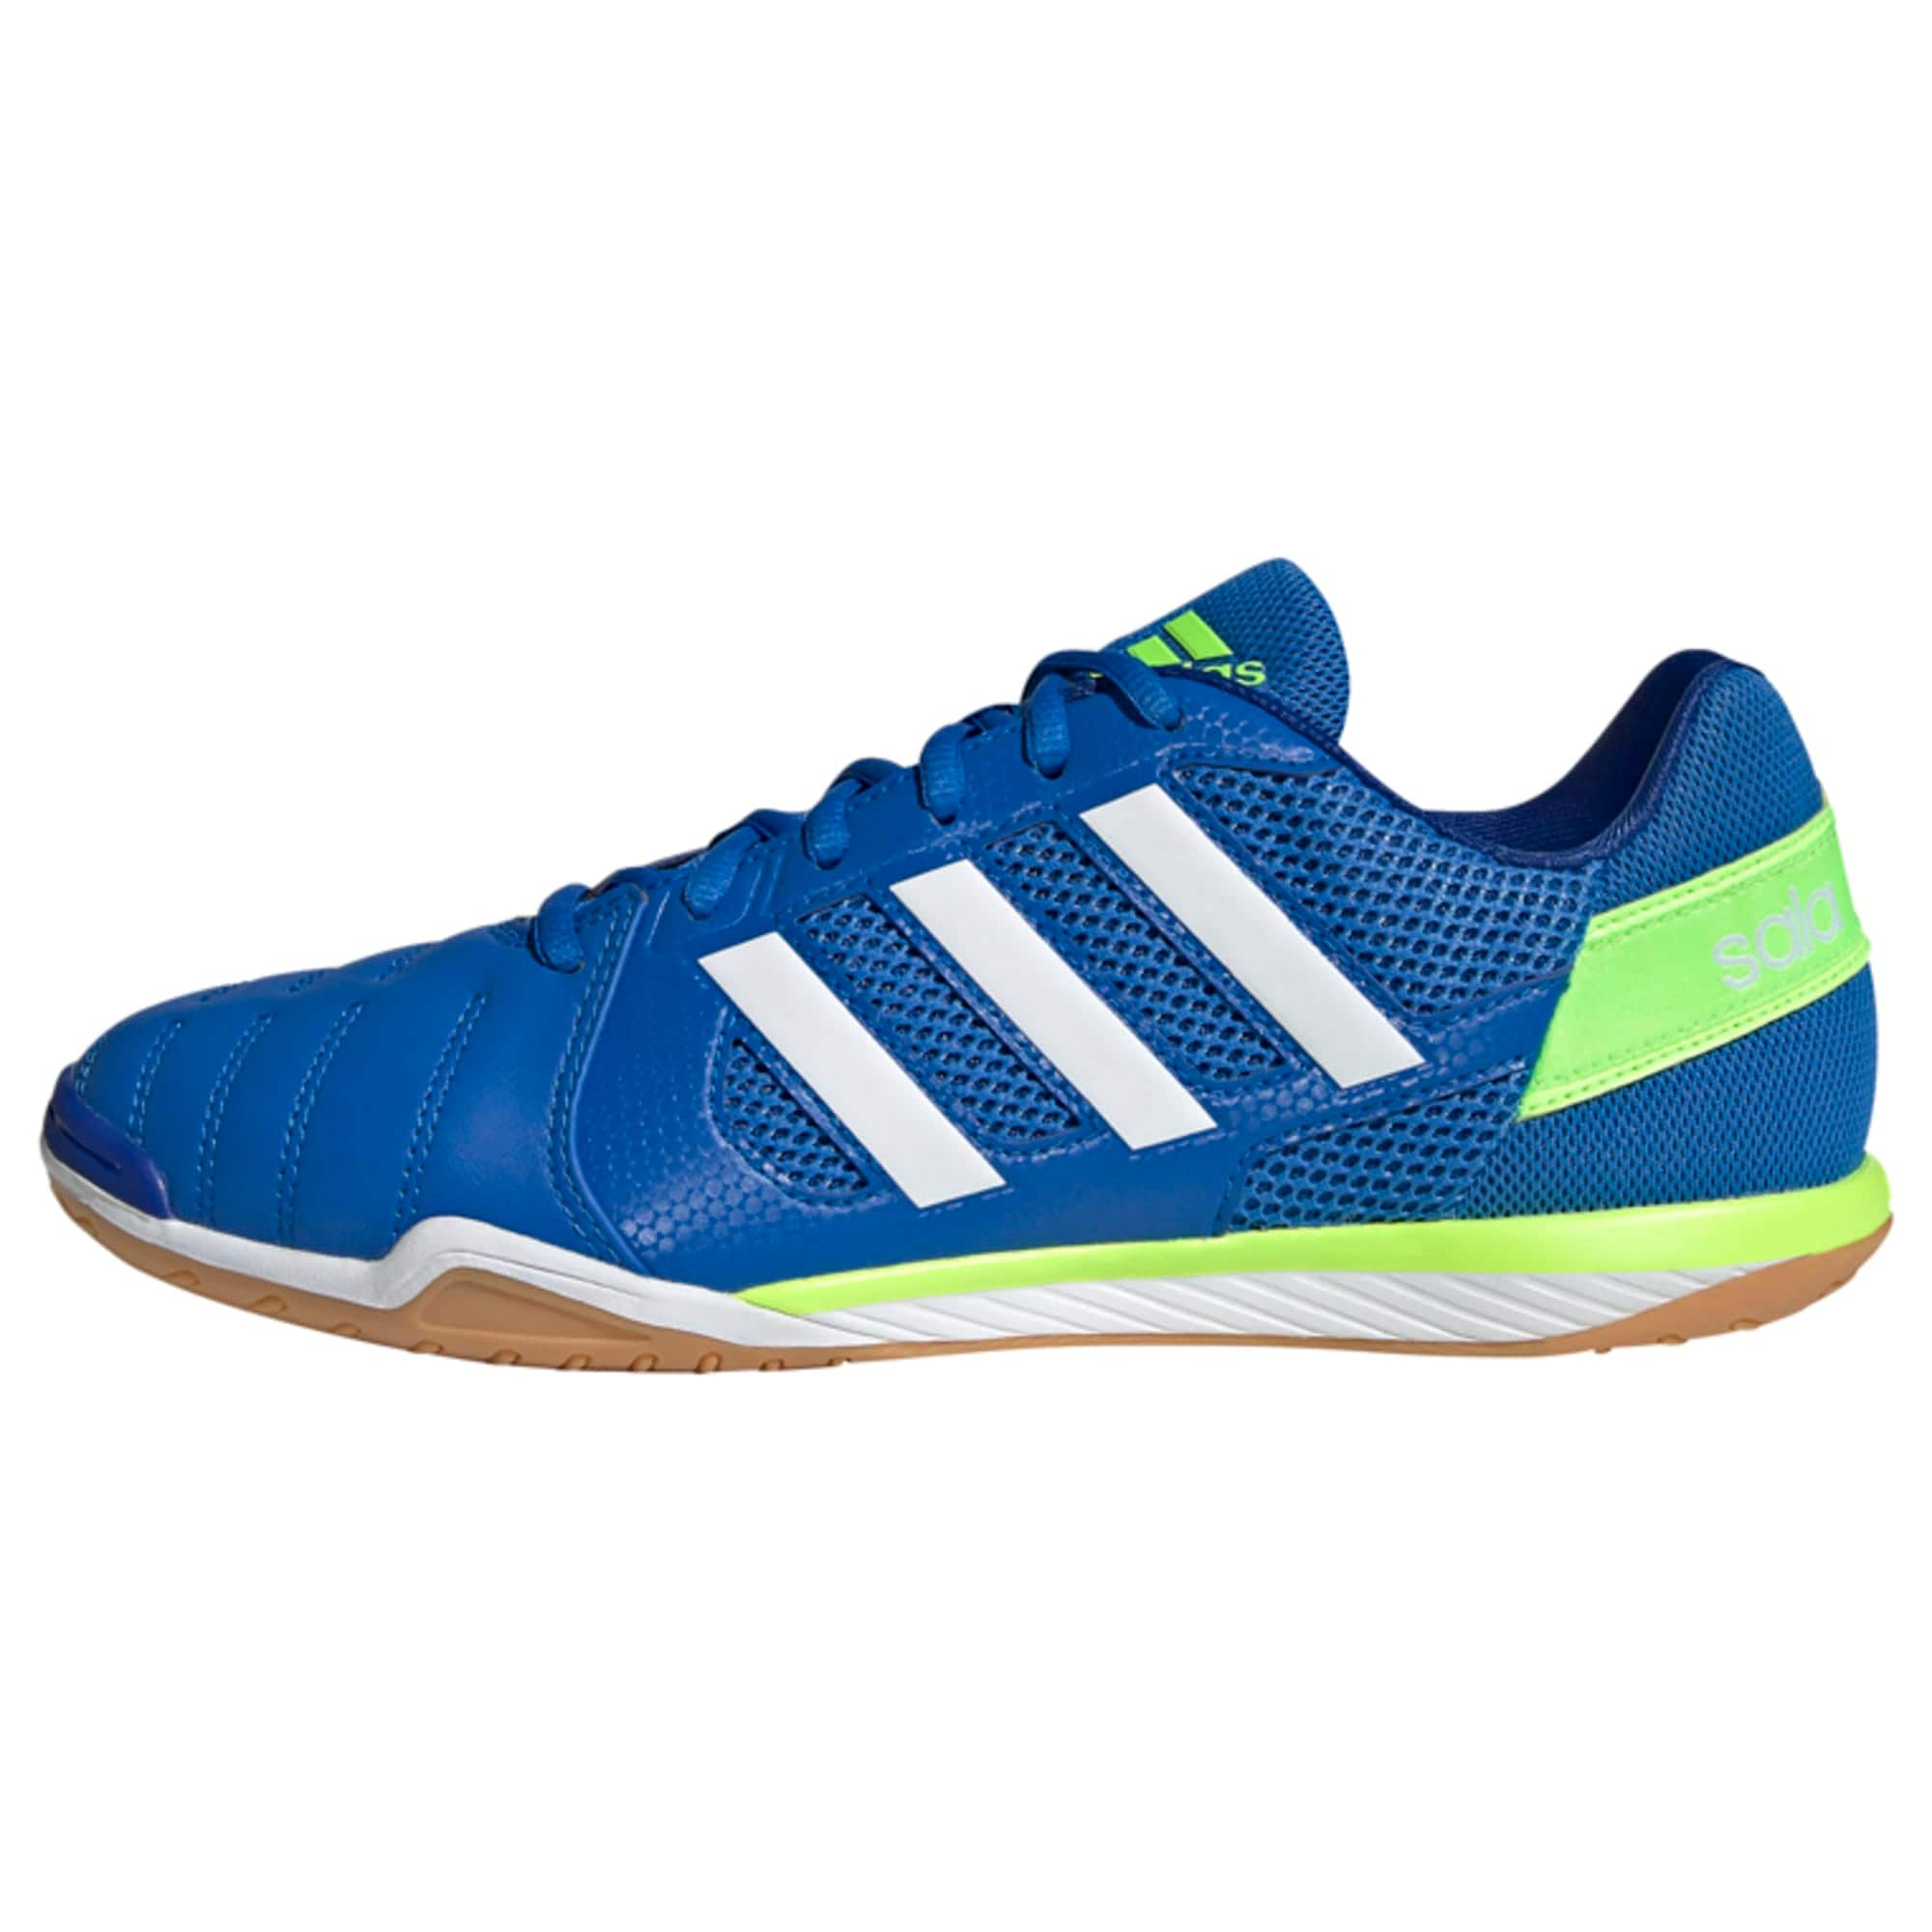 ADIDAS PERFORMANCE Futbolo bateliai mėlyna / žalia / balta